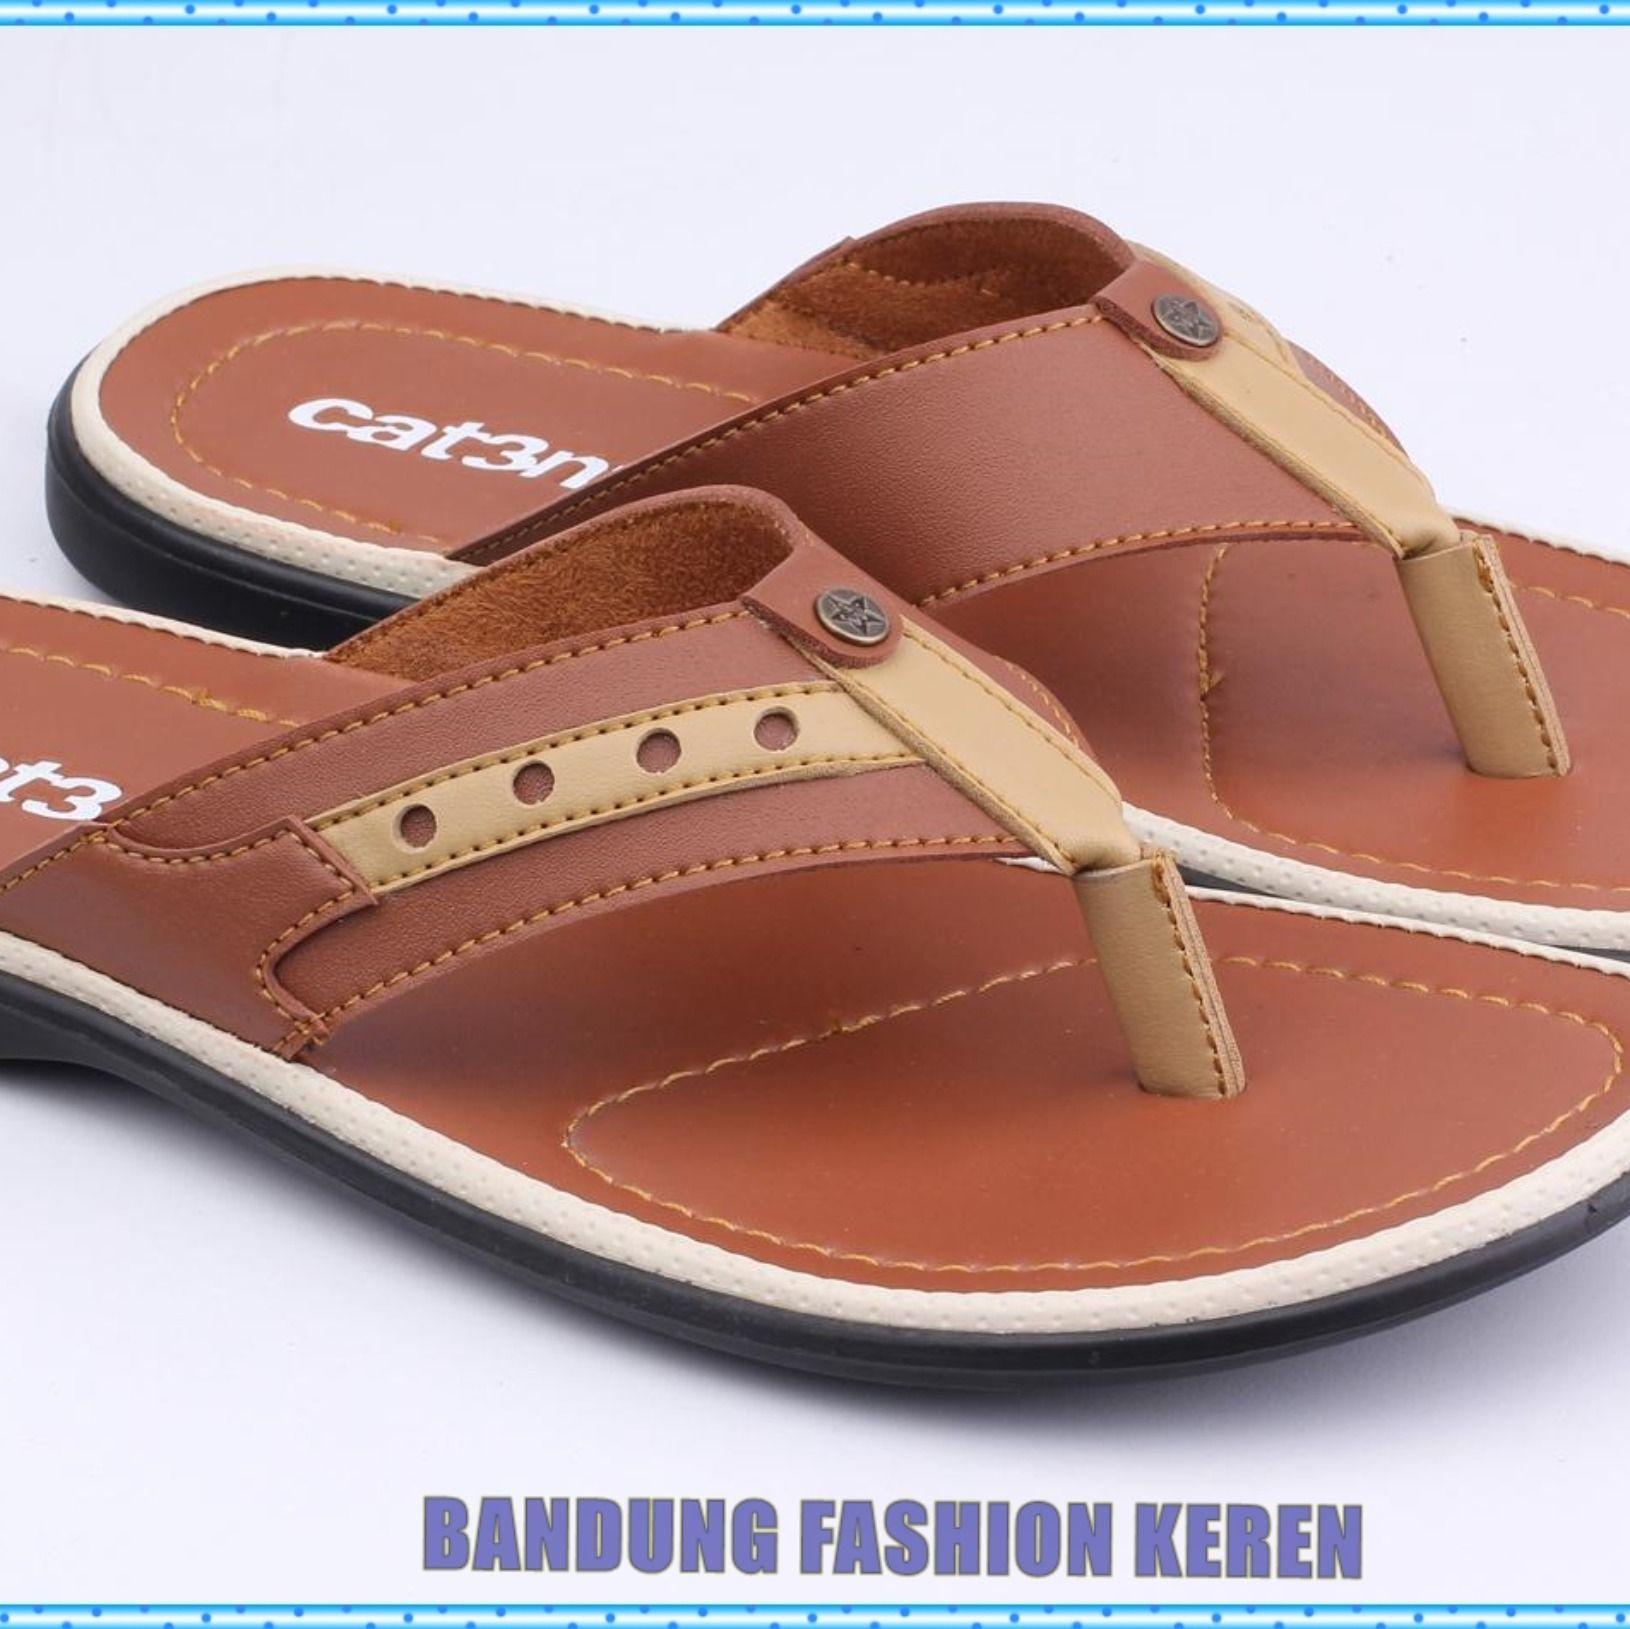 Sandal Casual Pria Im 005 Produk Fashion Handmade Terbaik 100